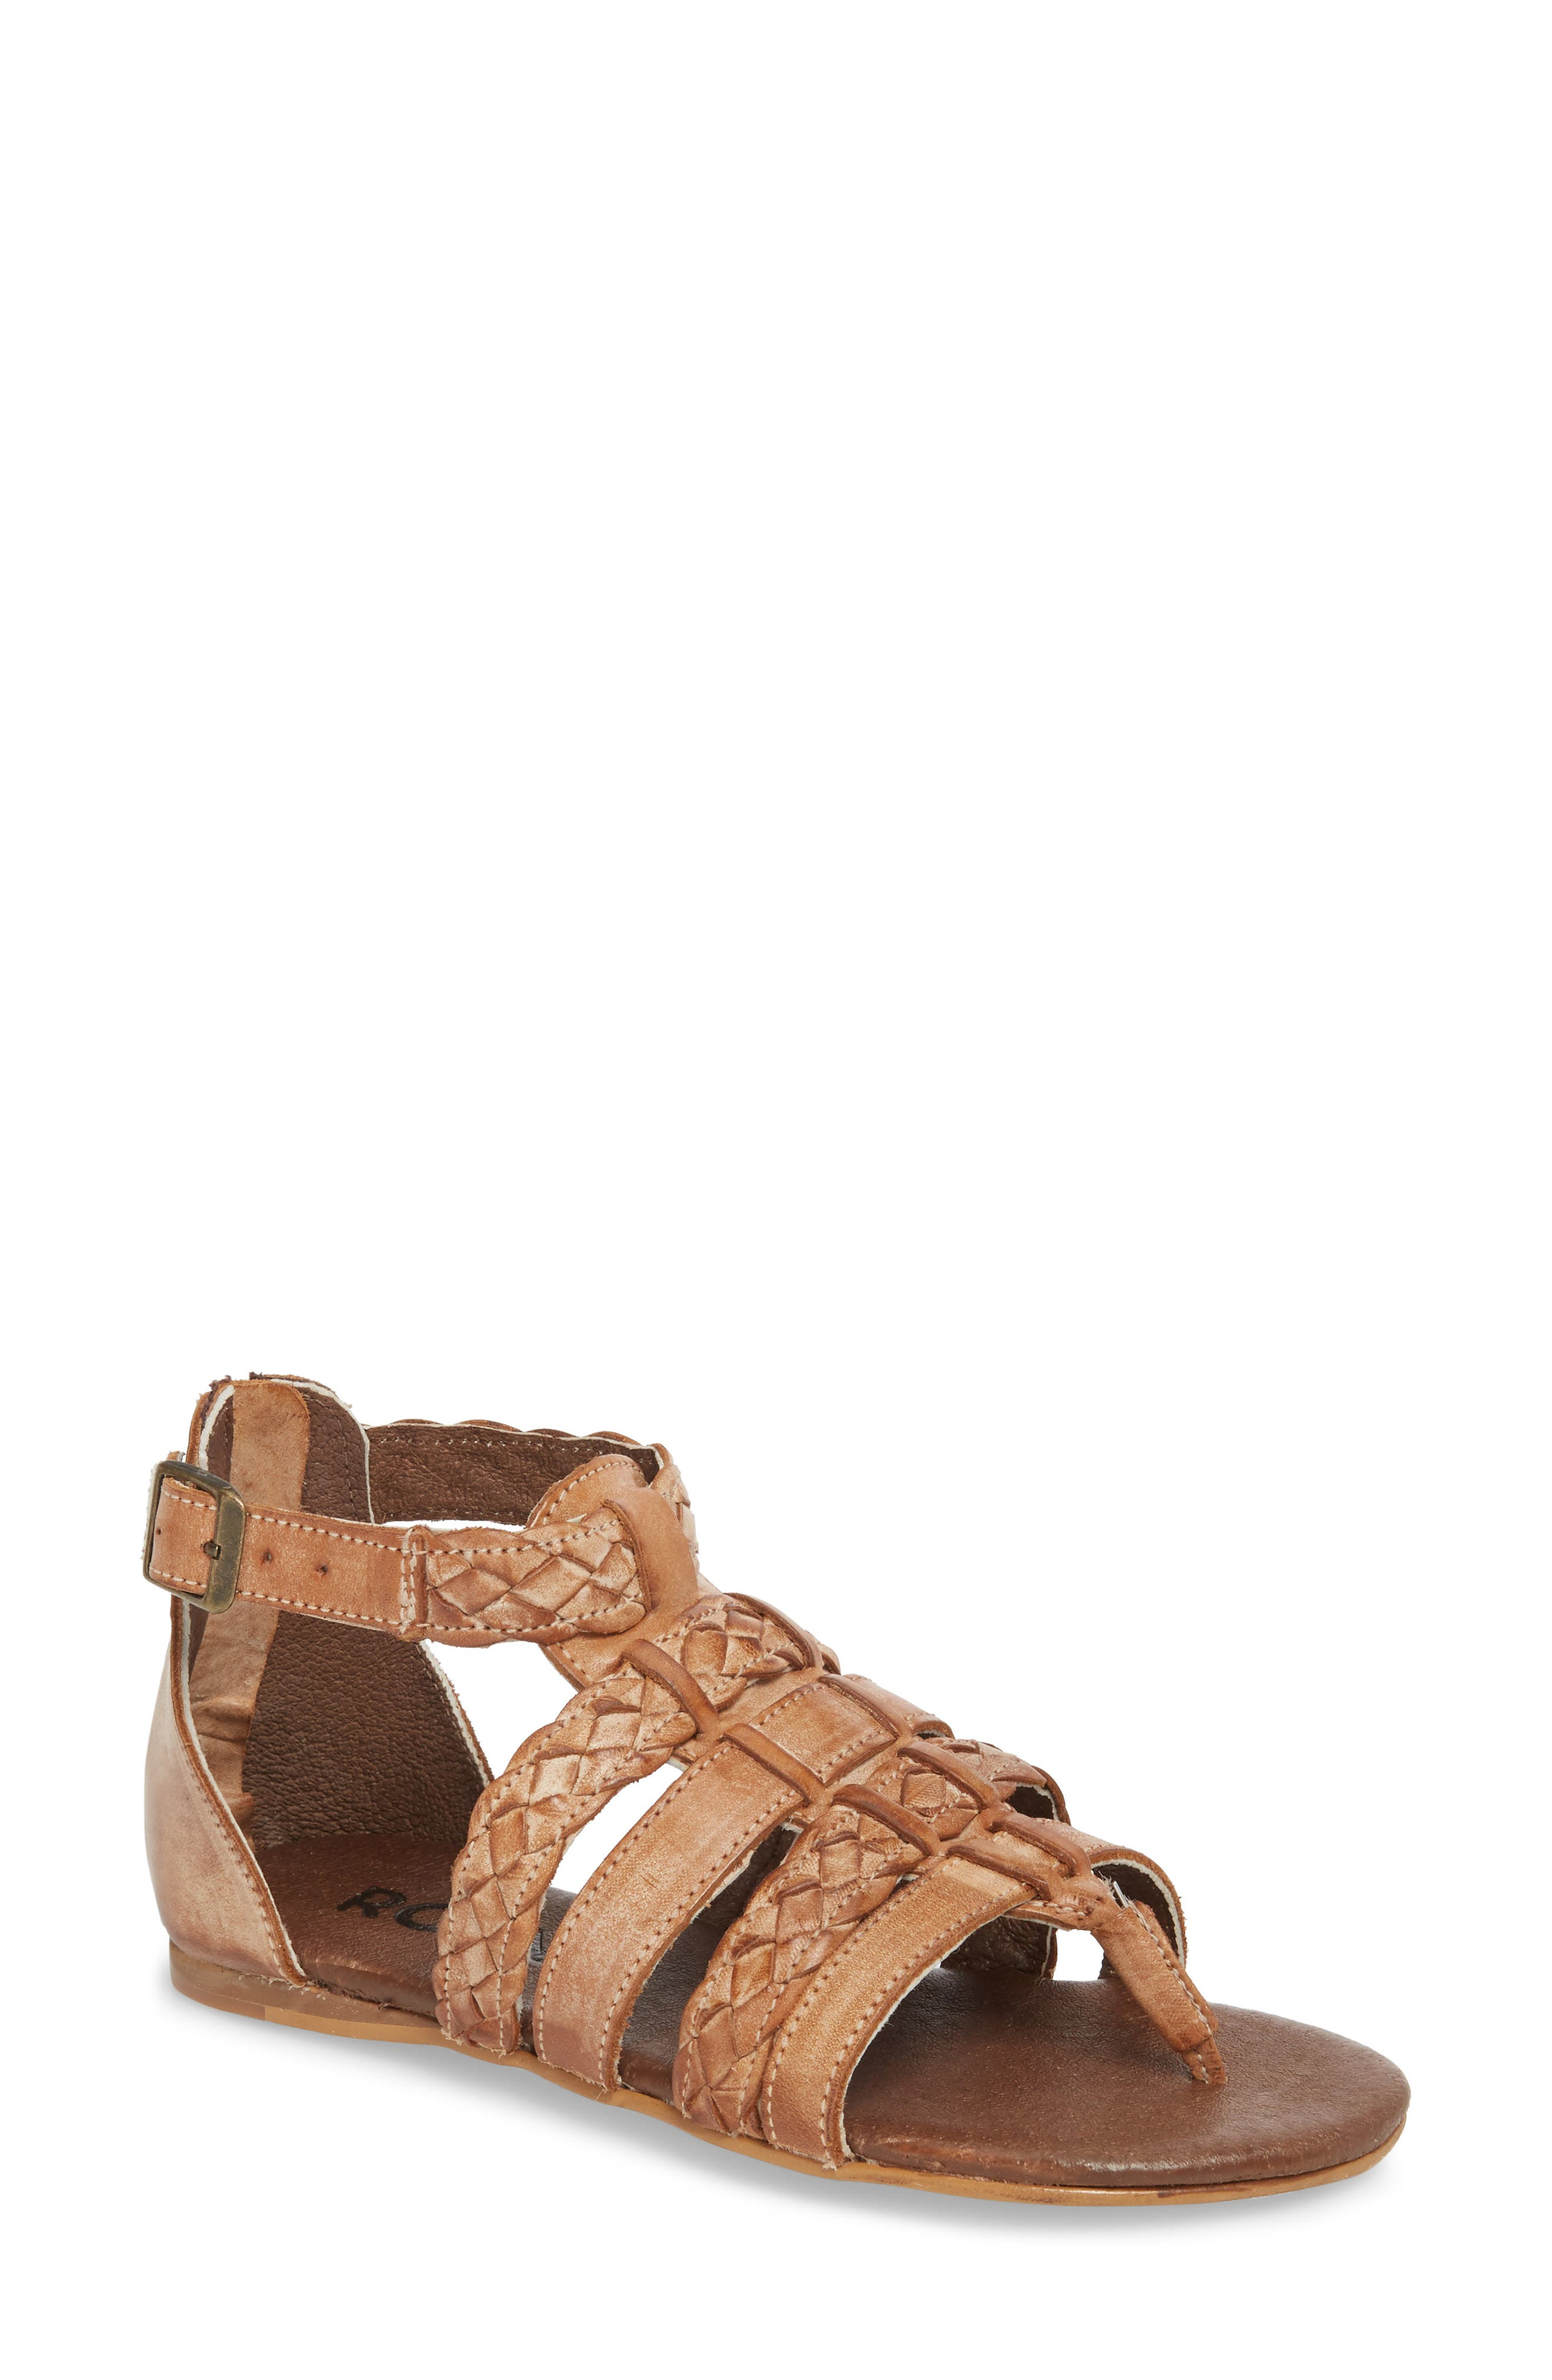 Kaliope Sandal,                         Main,                         color, VICTORIA COGNAC/ WHITE